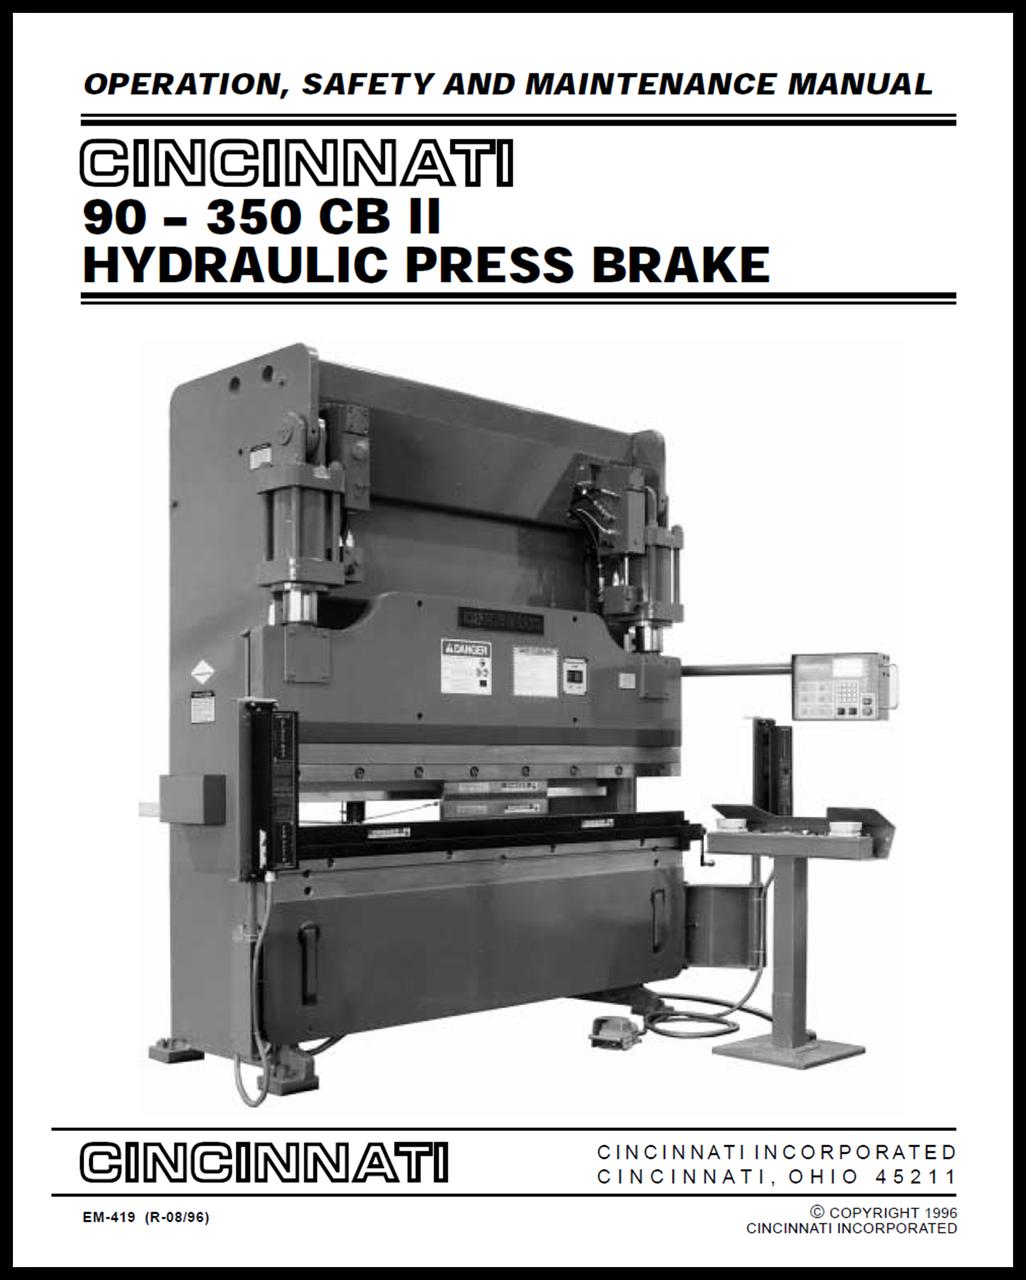 90-350 CB II Hydraulic Press Brake Operation, Safety and Maintenance Manual  (EM-419) - Cincinnati Incorporated